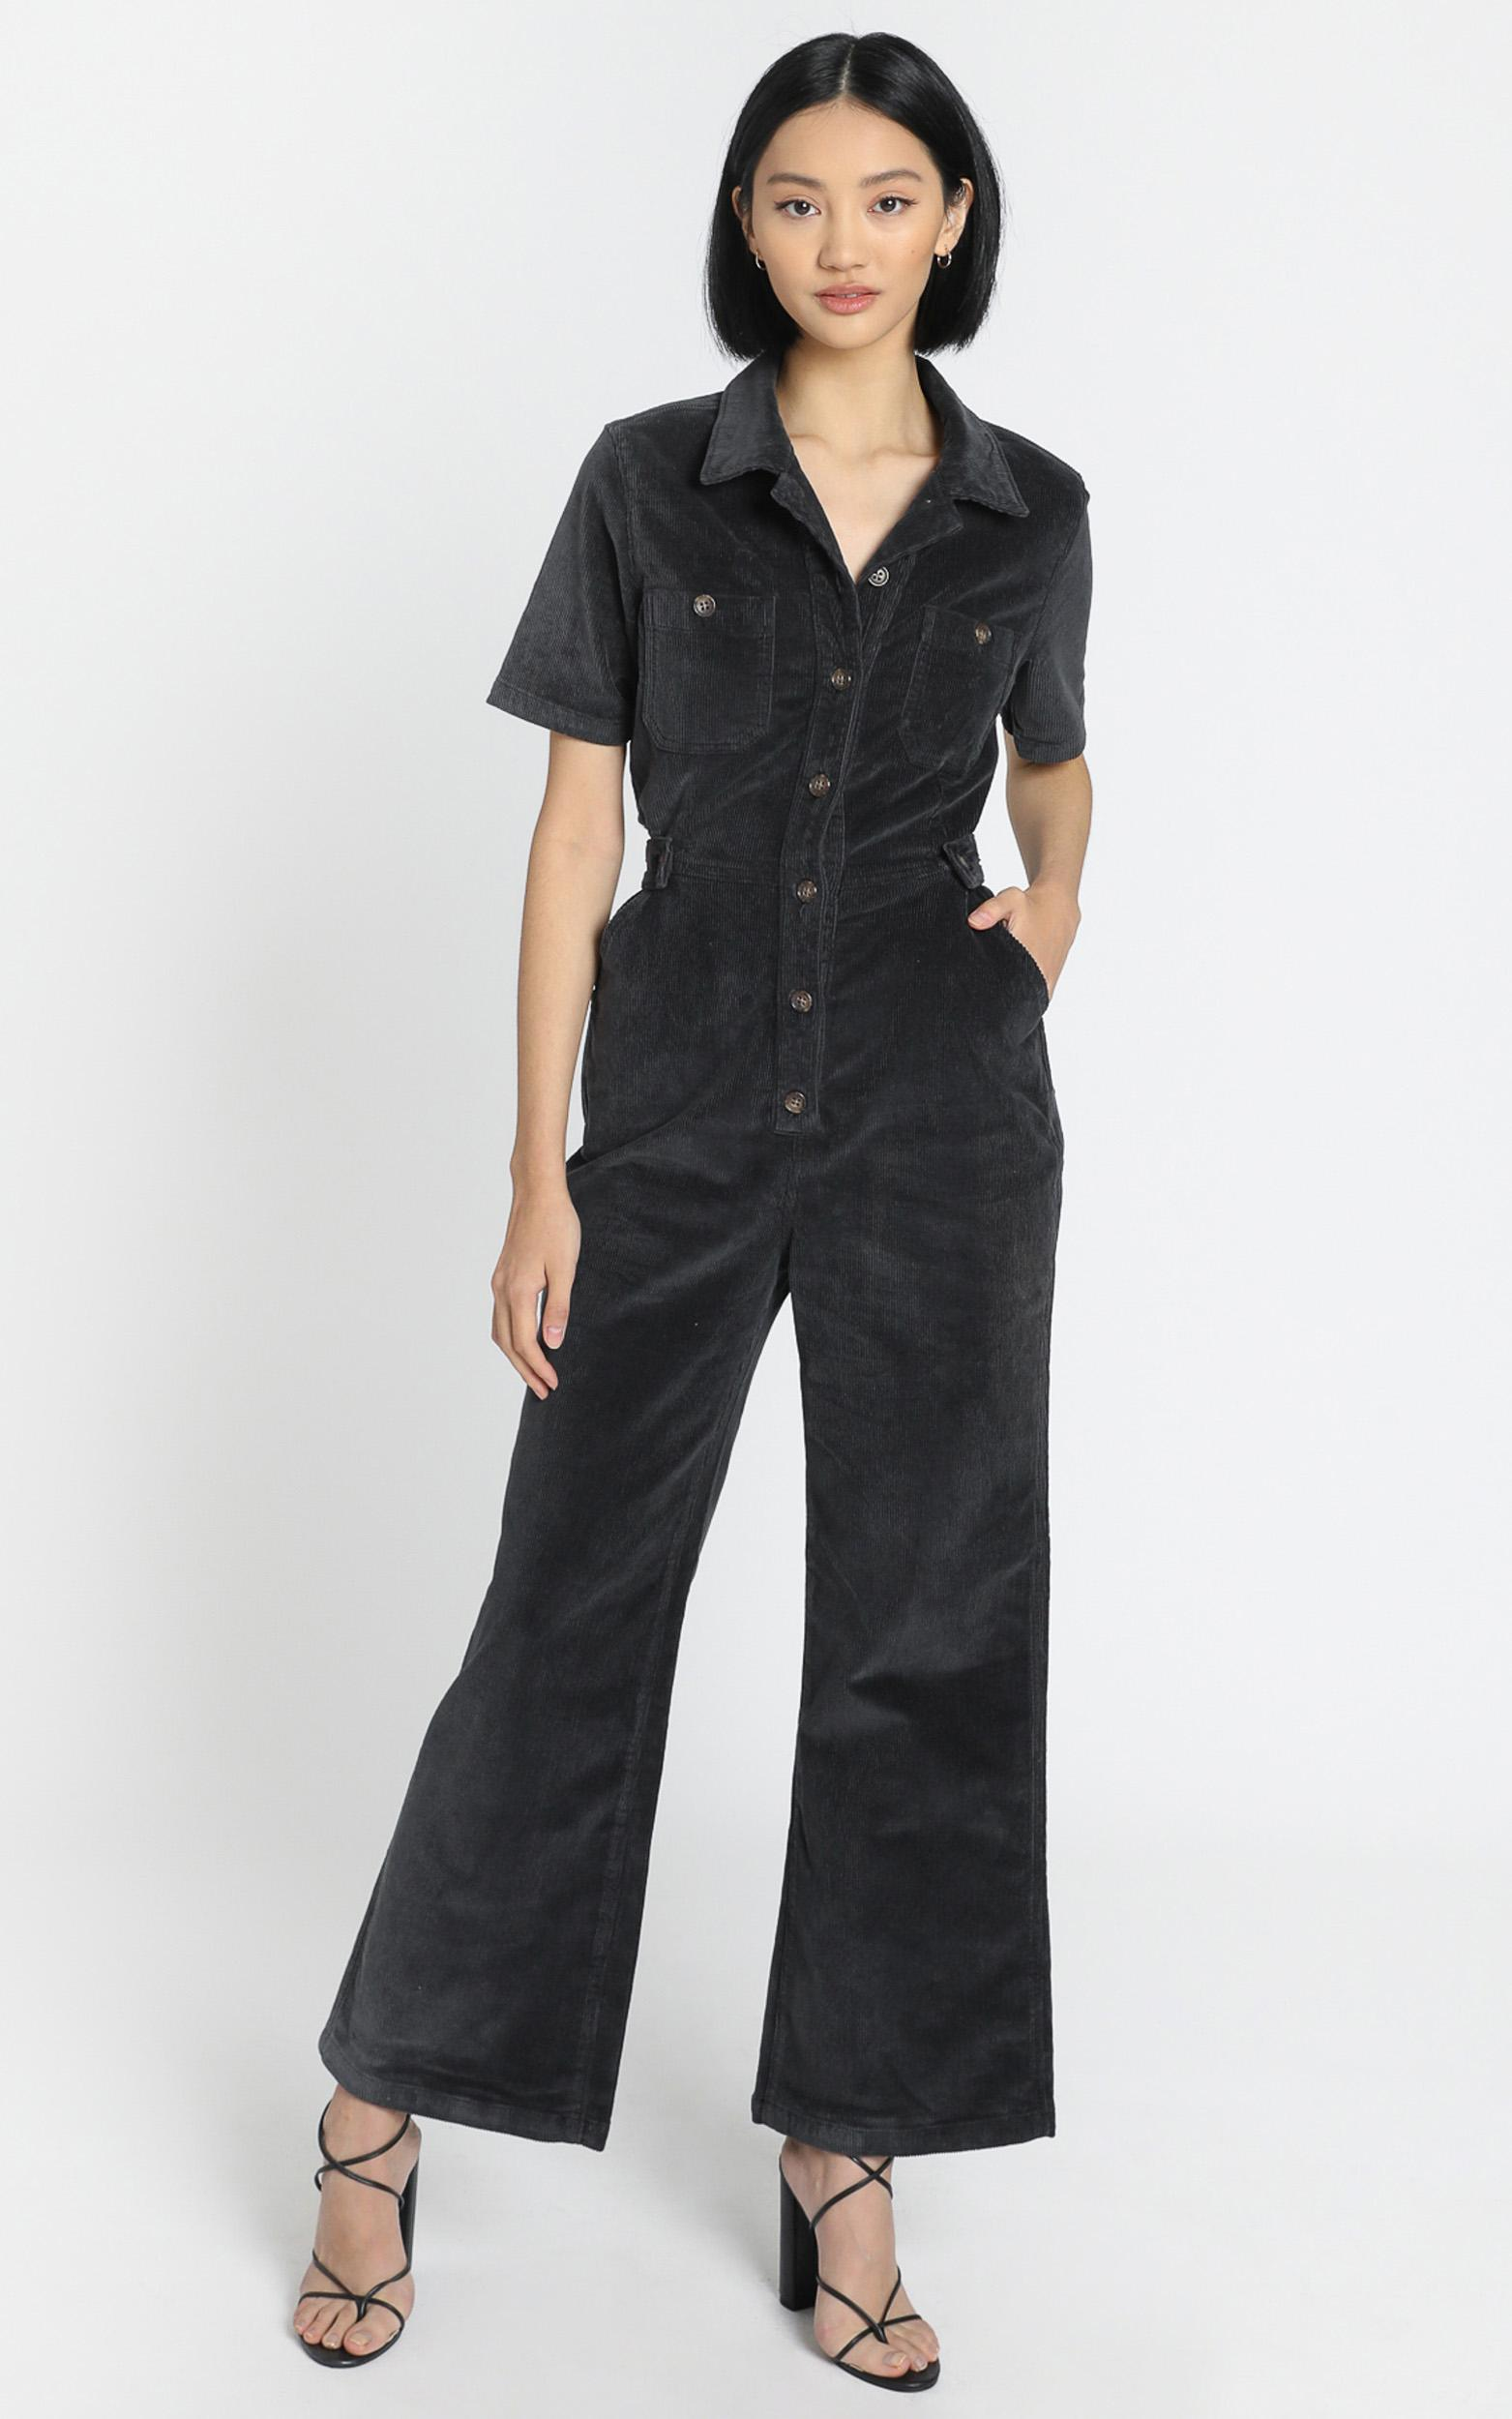 Wrangler - Broadways Jumpsuit in Midnight Black - 6 (XS), Black, hi-res image number null